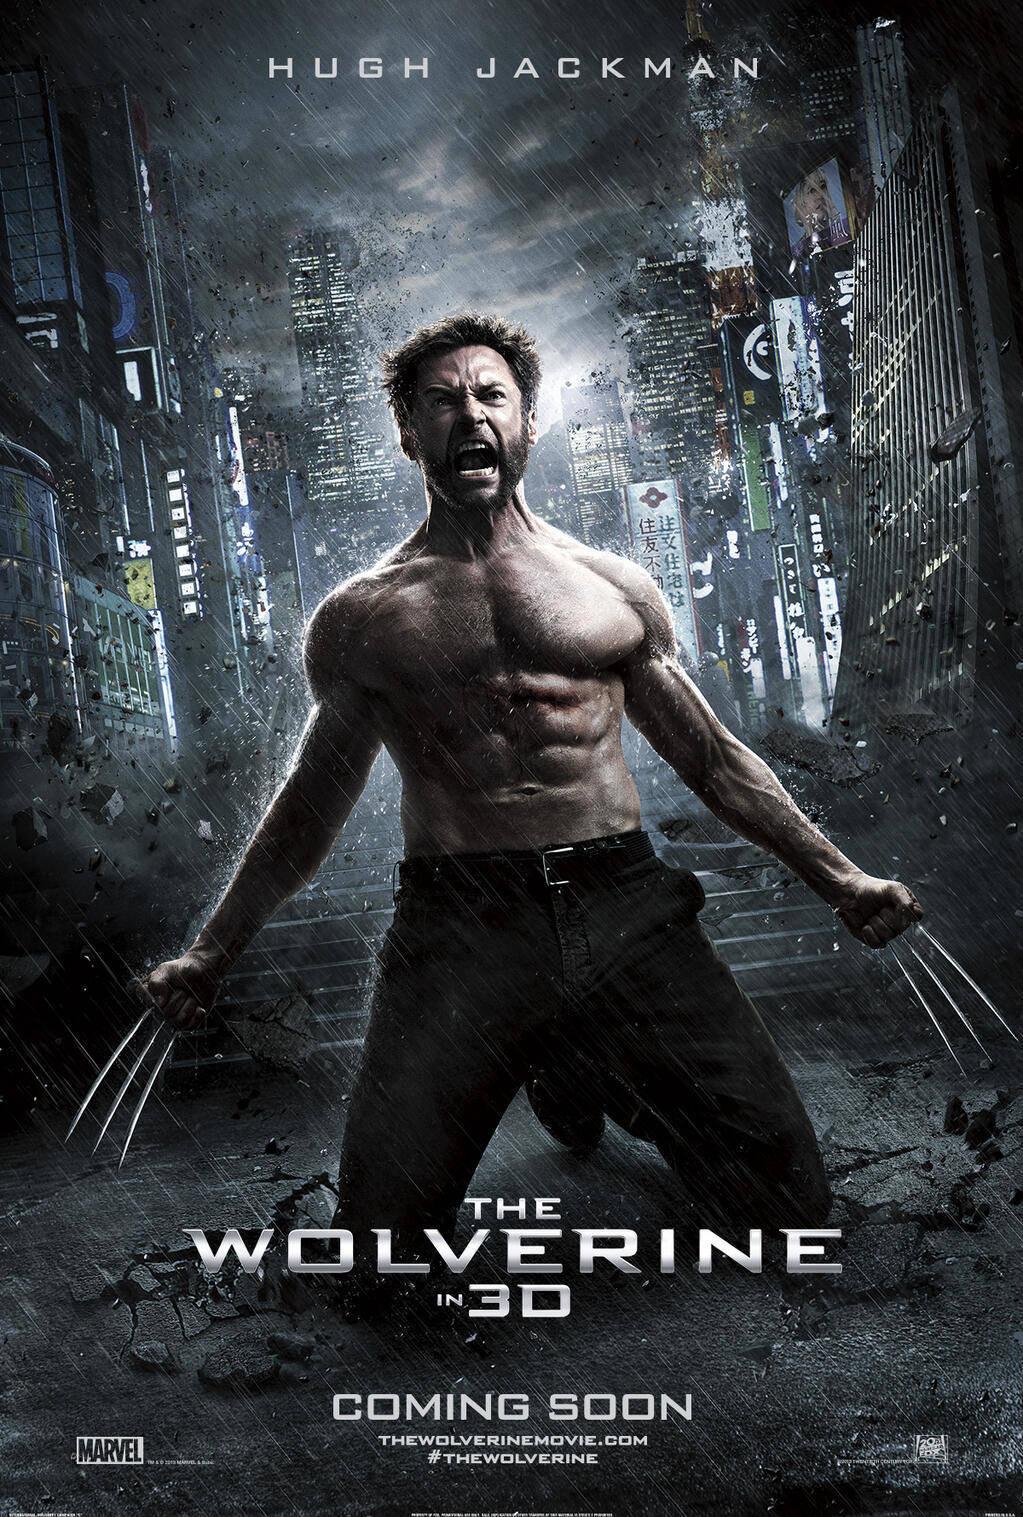 Wolverine İndir 720p-1080p Türkçe Dublaj TR-ENG BluRay 2013 Film